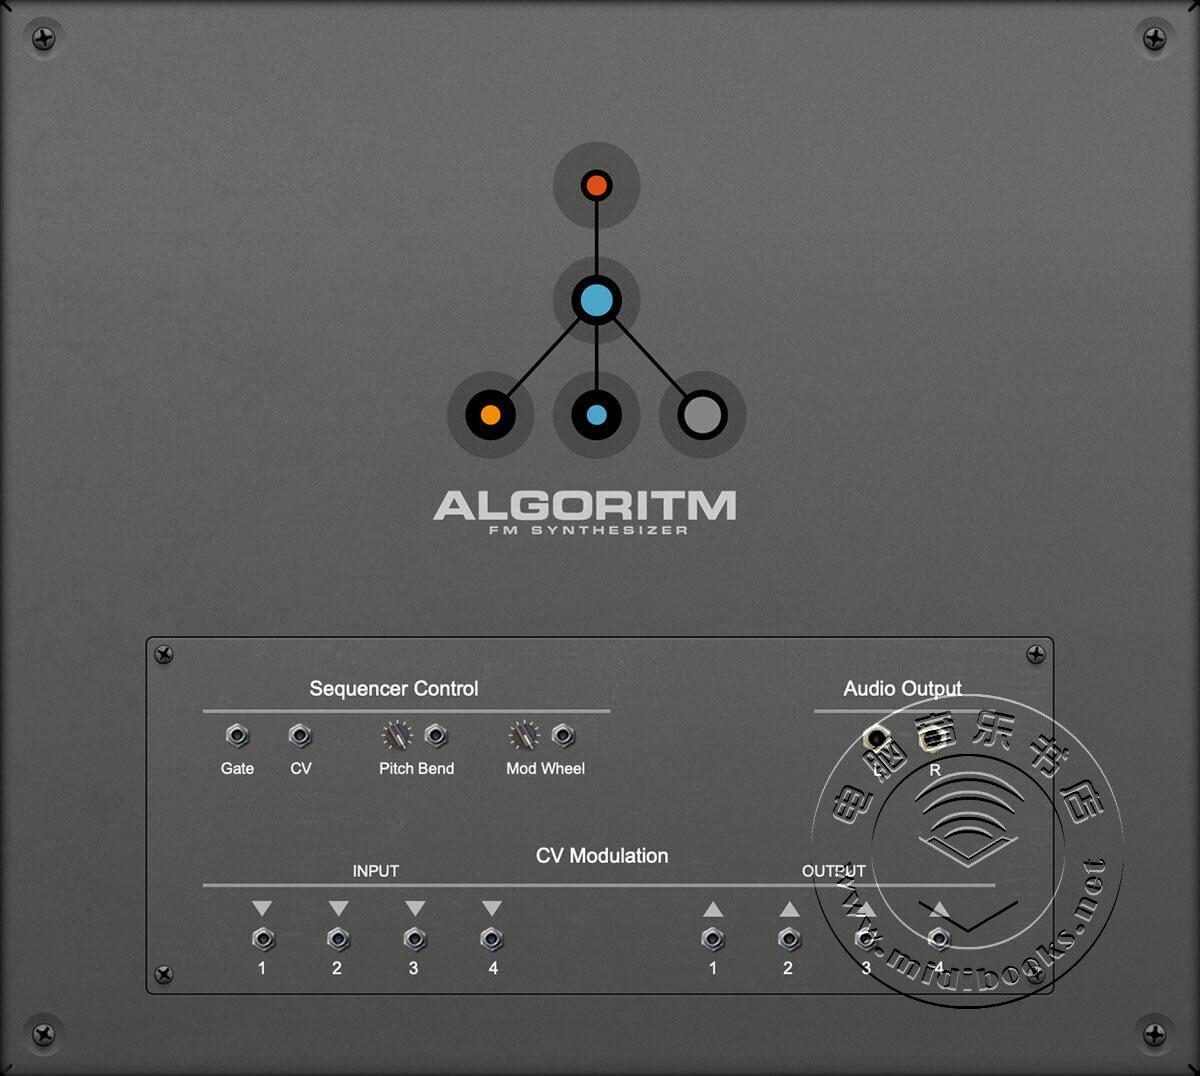 Reason Studios发布具有时尚外观的Algoritm FM合成器(视频)